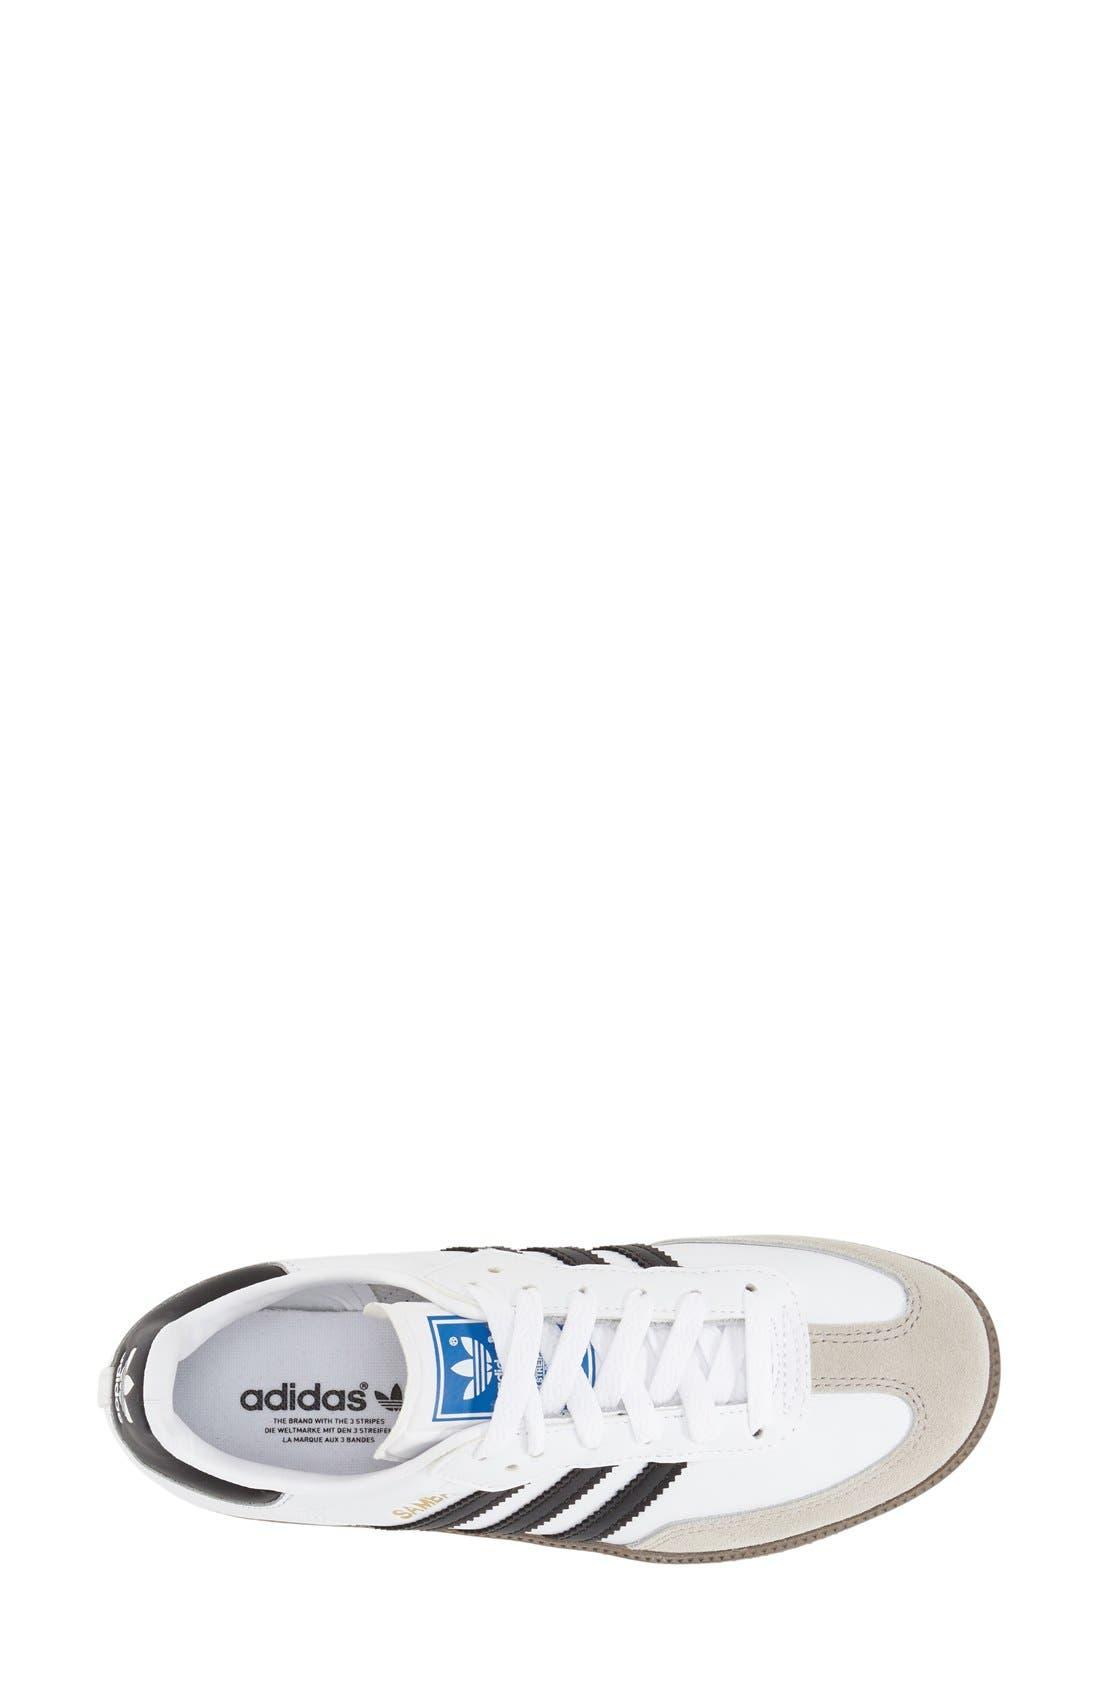 Alternate Image 3  - adidas 'Samba' Sneaker (Women)